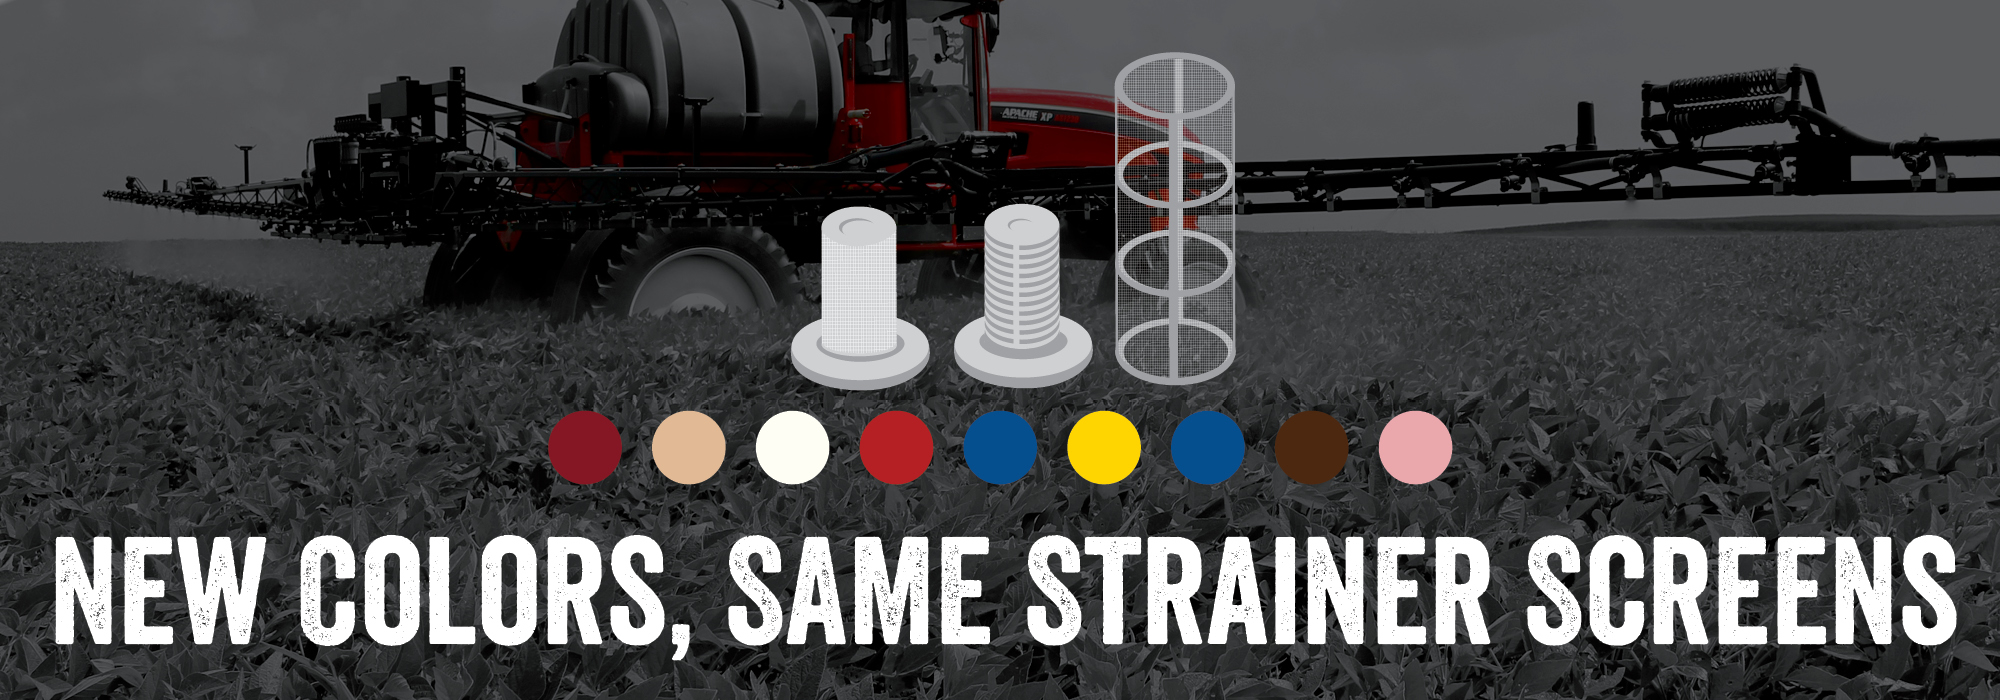 Apache Sprayers Straining Screens Colors Header Image